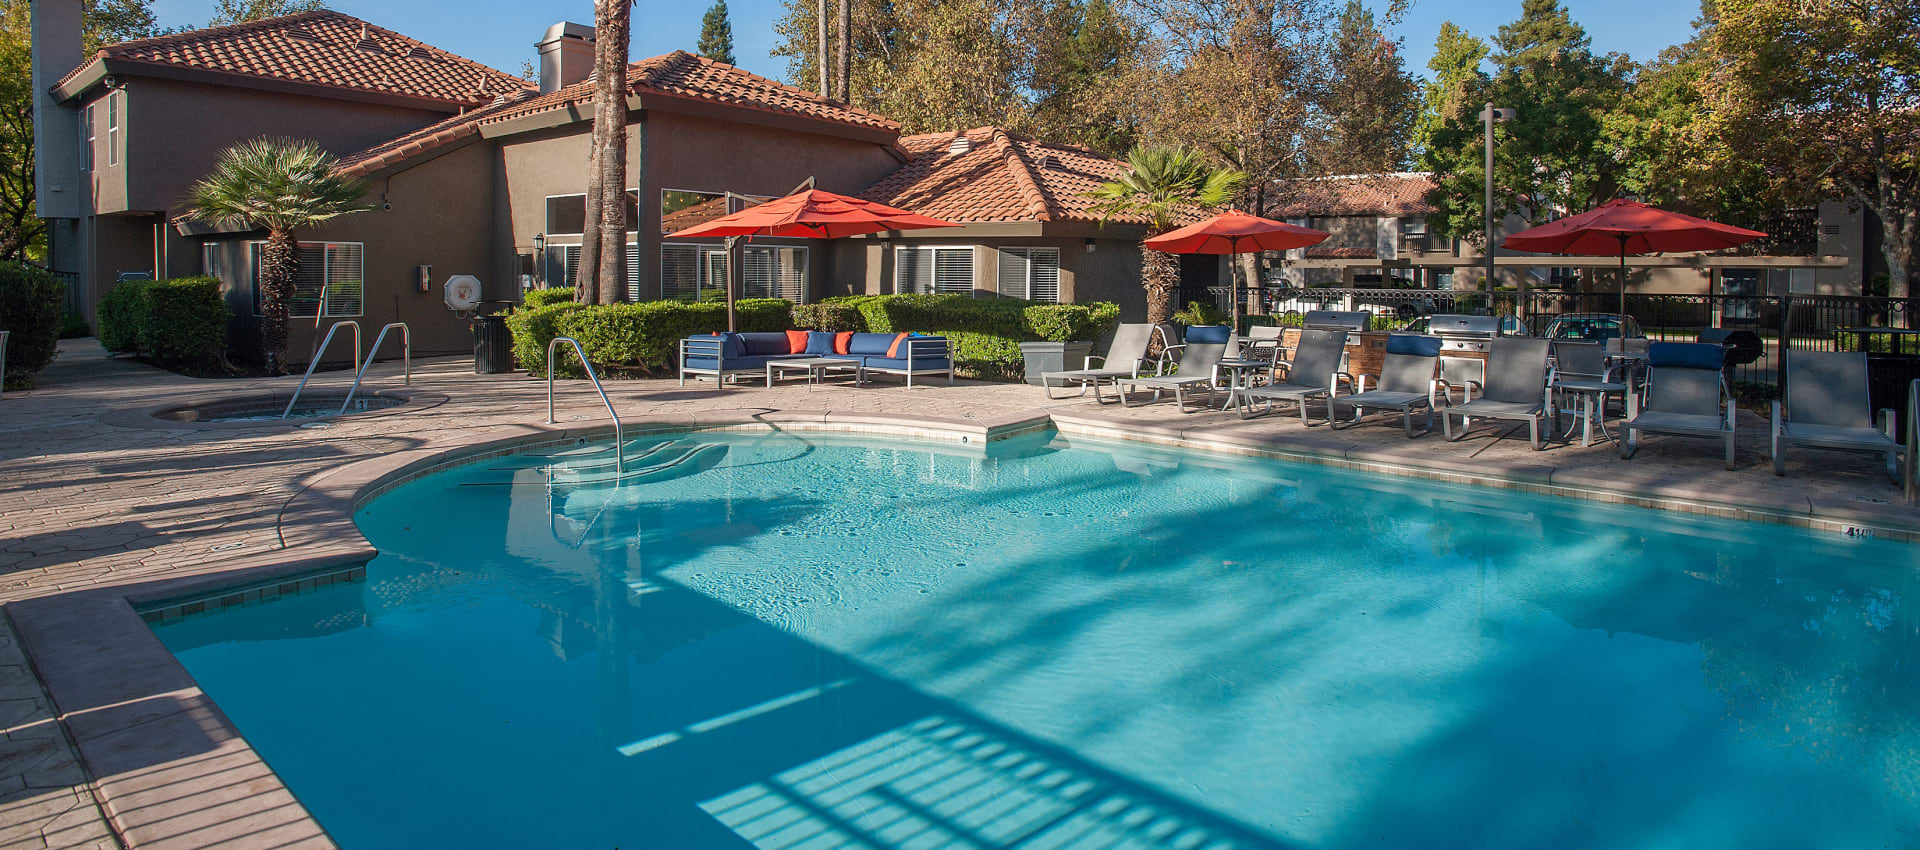 Resident swimming pool at Shore Park at Riverlake in Sacramento, California